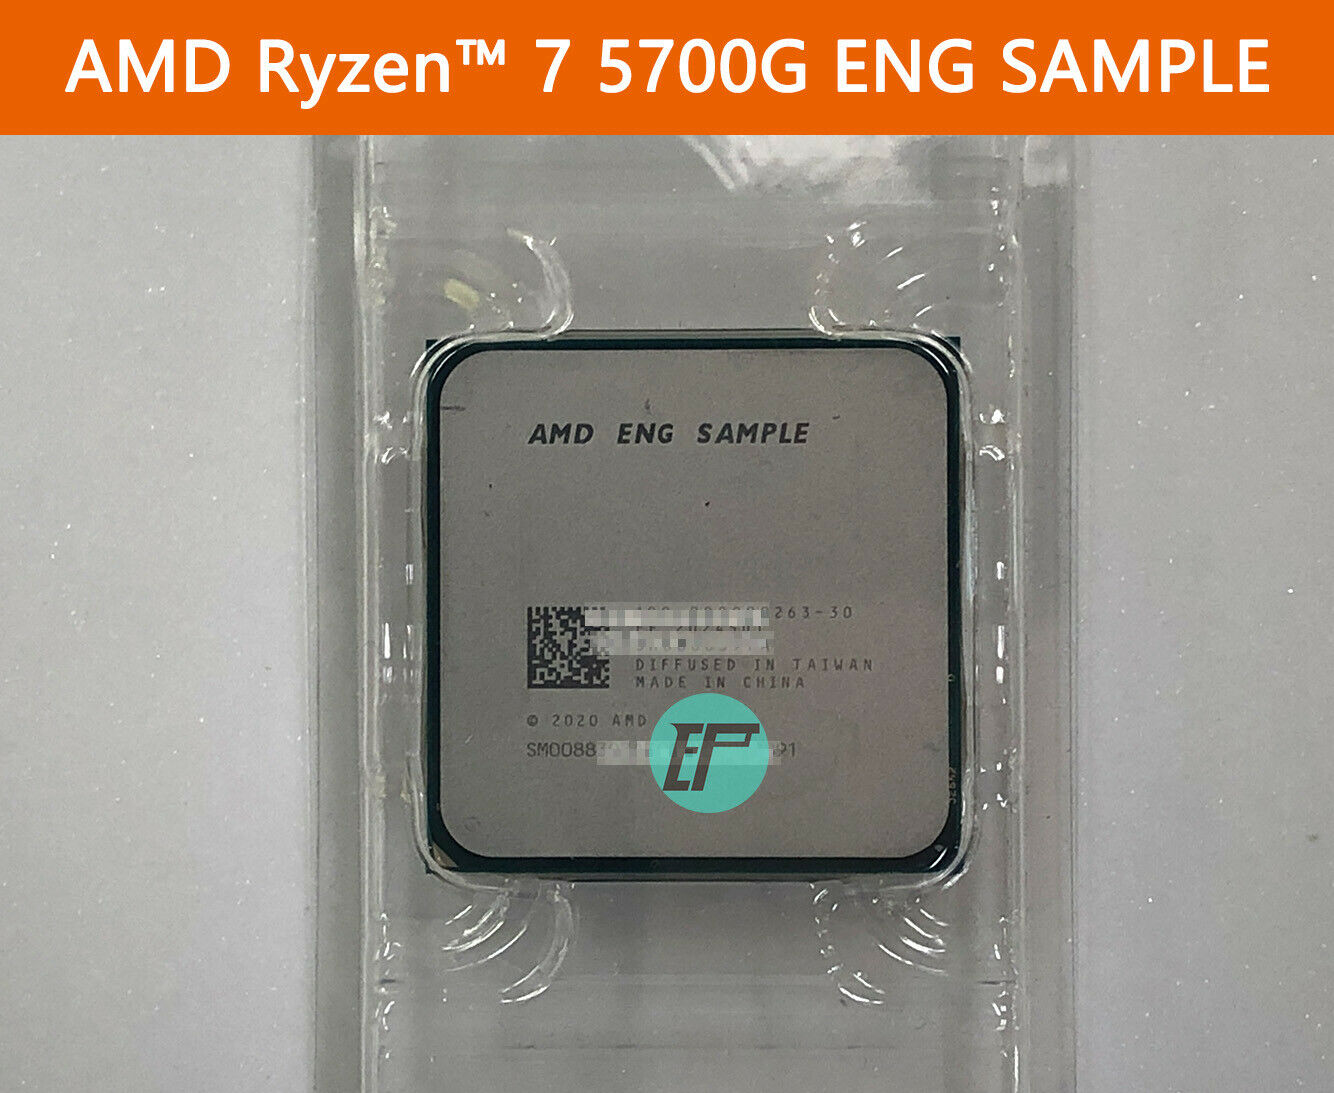 amd-ryzen-7-5700g-cezanne-'zen-3'-desktop-apu-on-sale-at-ebay-–-8-cores,-up-to-4.45-ghz-&-on-par-with-a-ryzen-7-5800x-when-overclocked